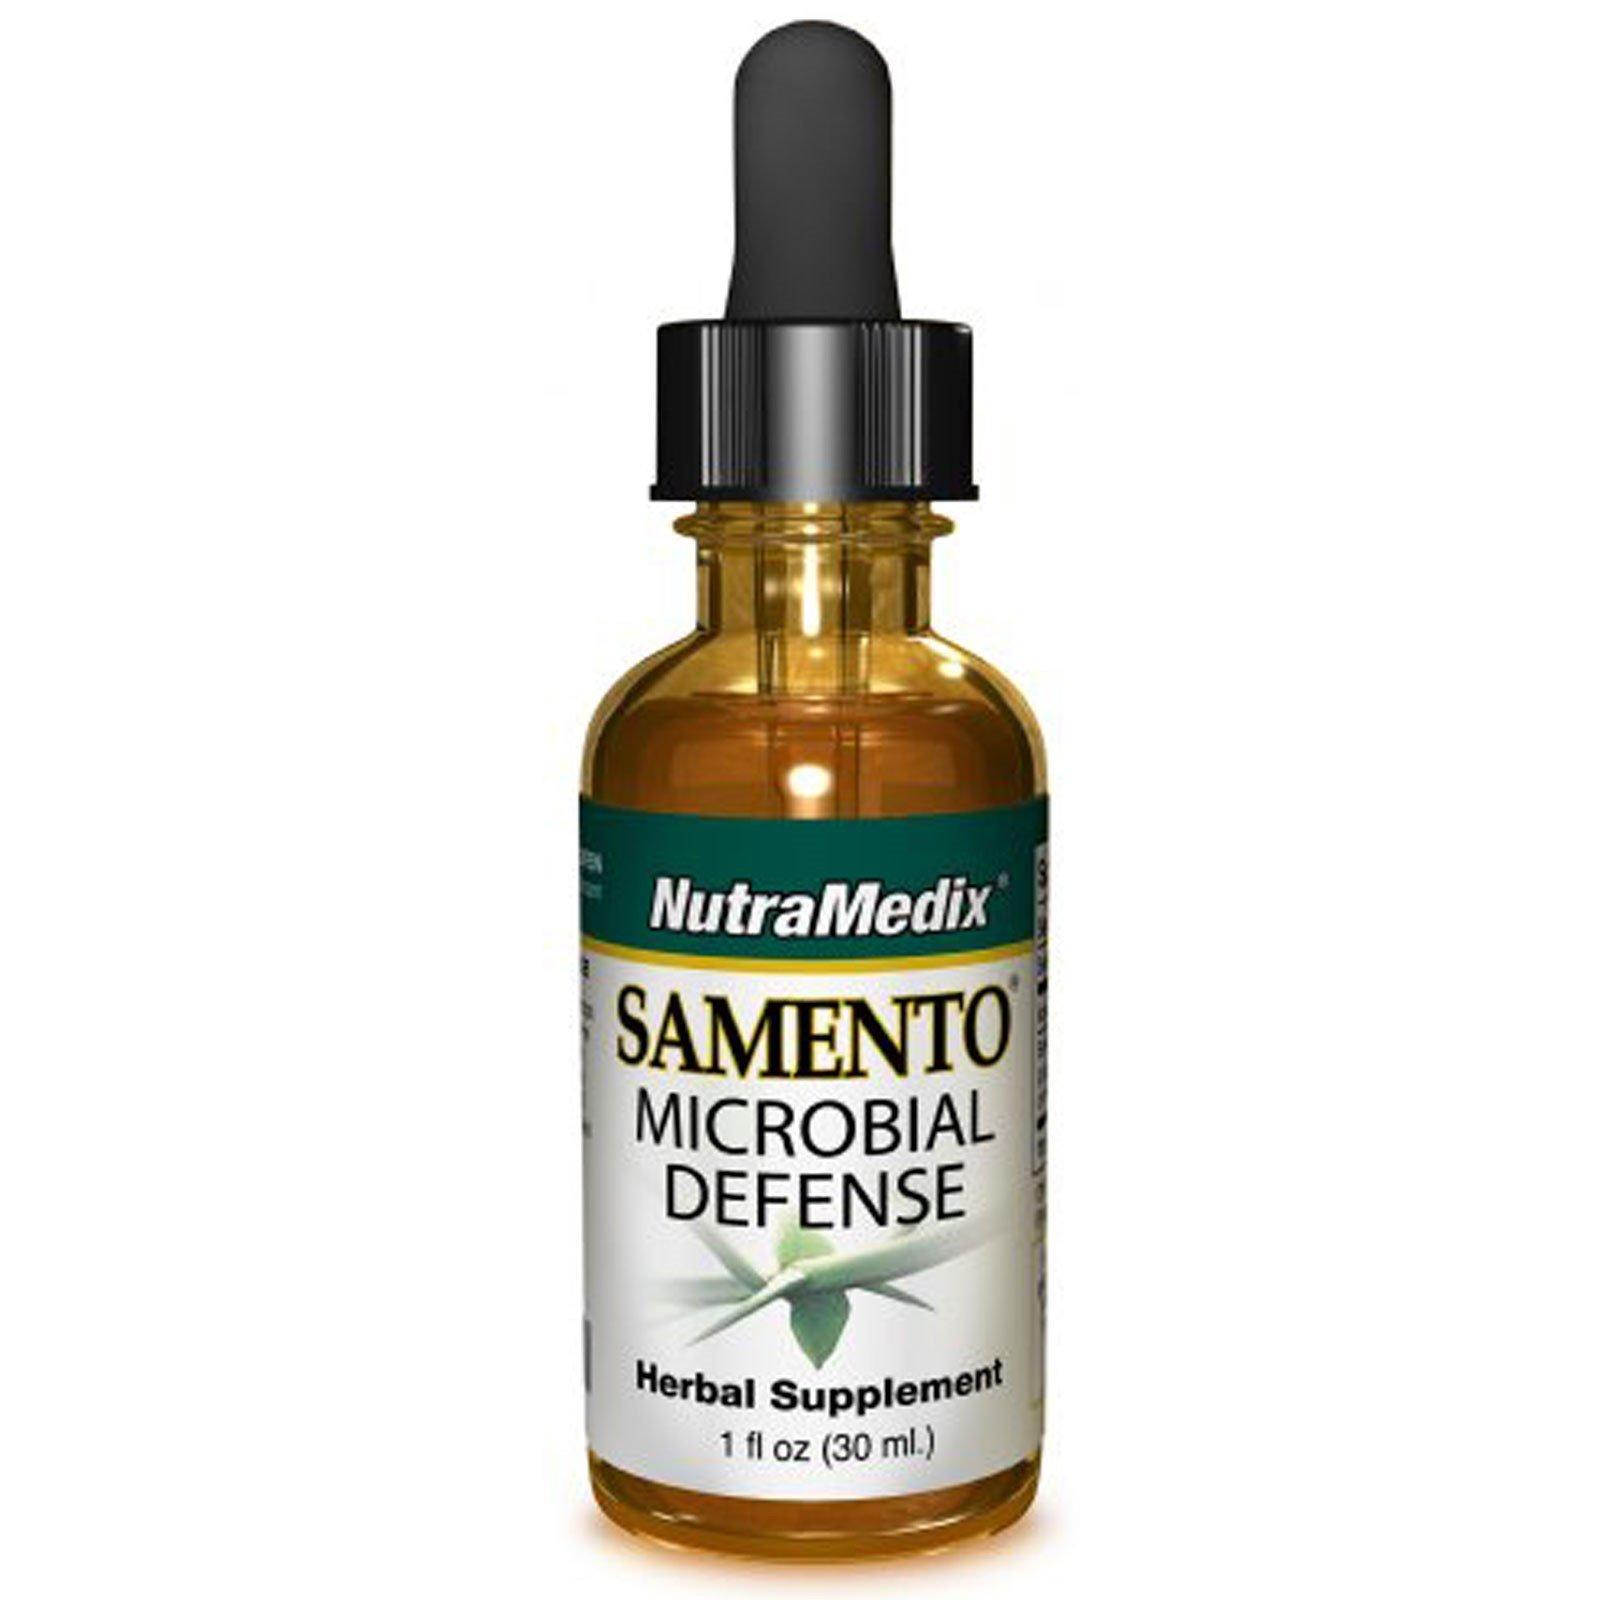 Samento Extract - Microbial Defense - 1 fl oz